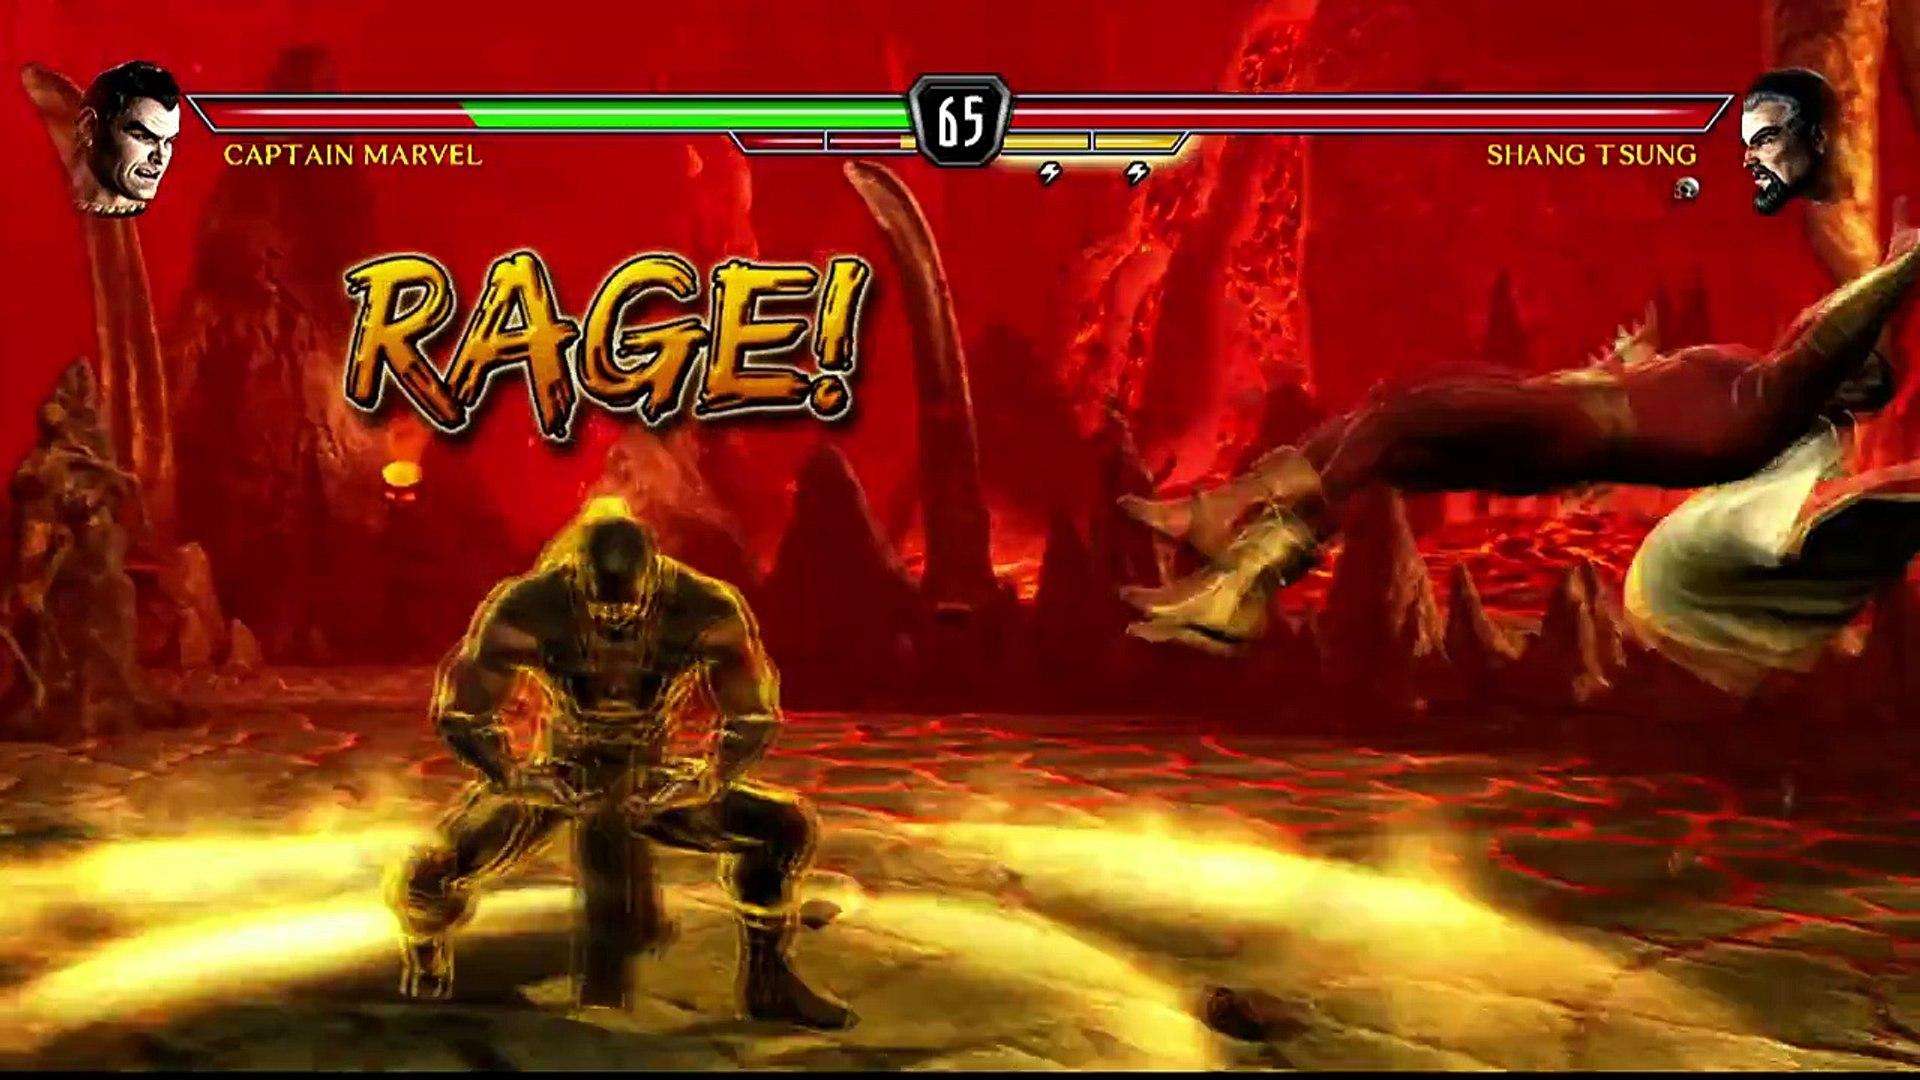 Mortal Kombat VS DC Universe [Xbox 360] - ✪ Captain Marvel Vs Shang Tsung ✪  | Full HD – Видео Dailymotion